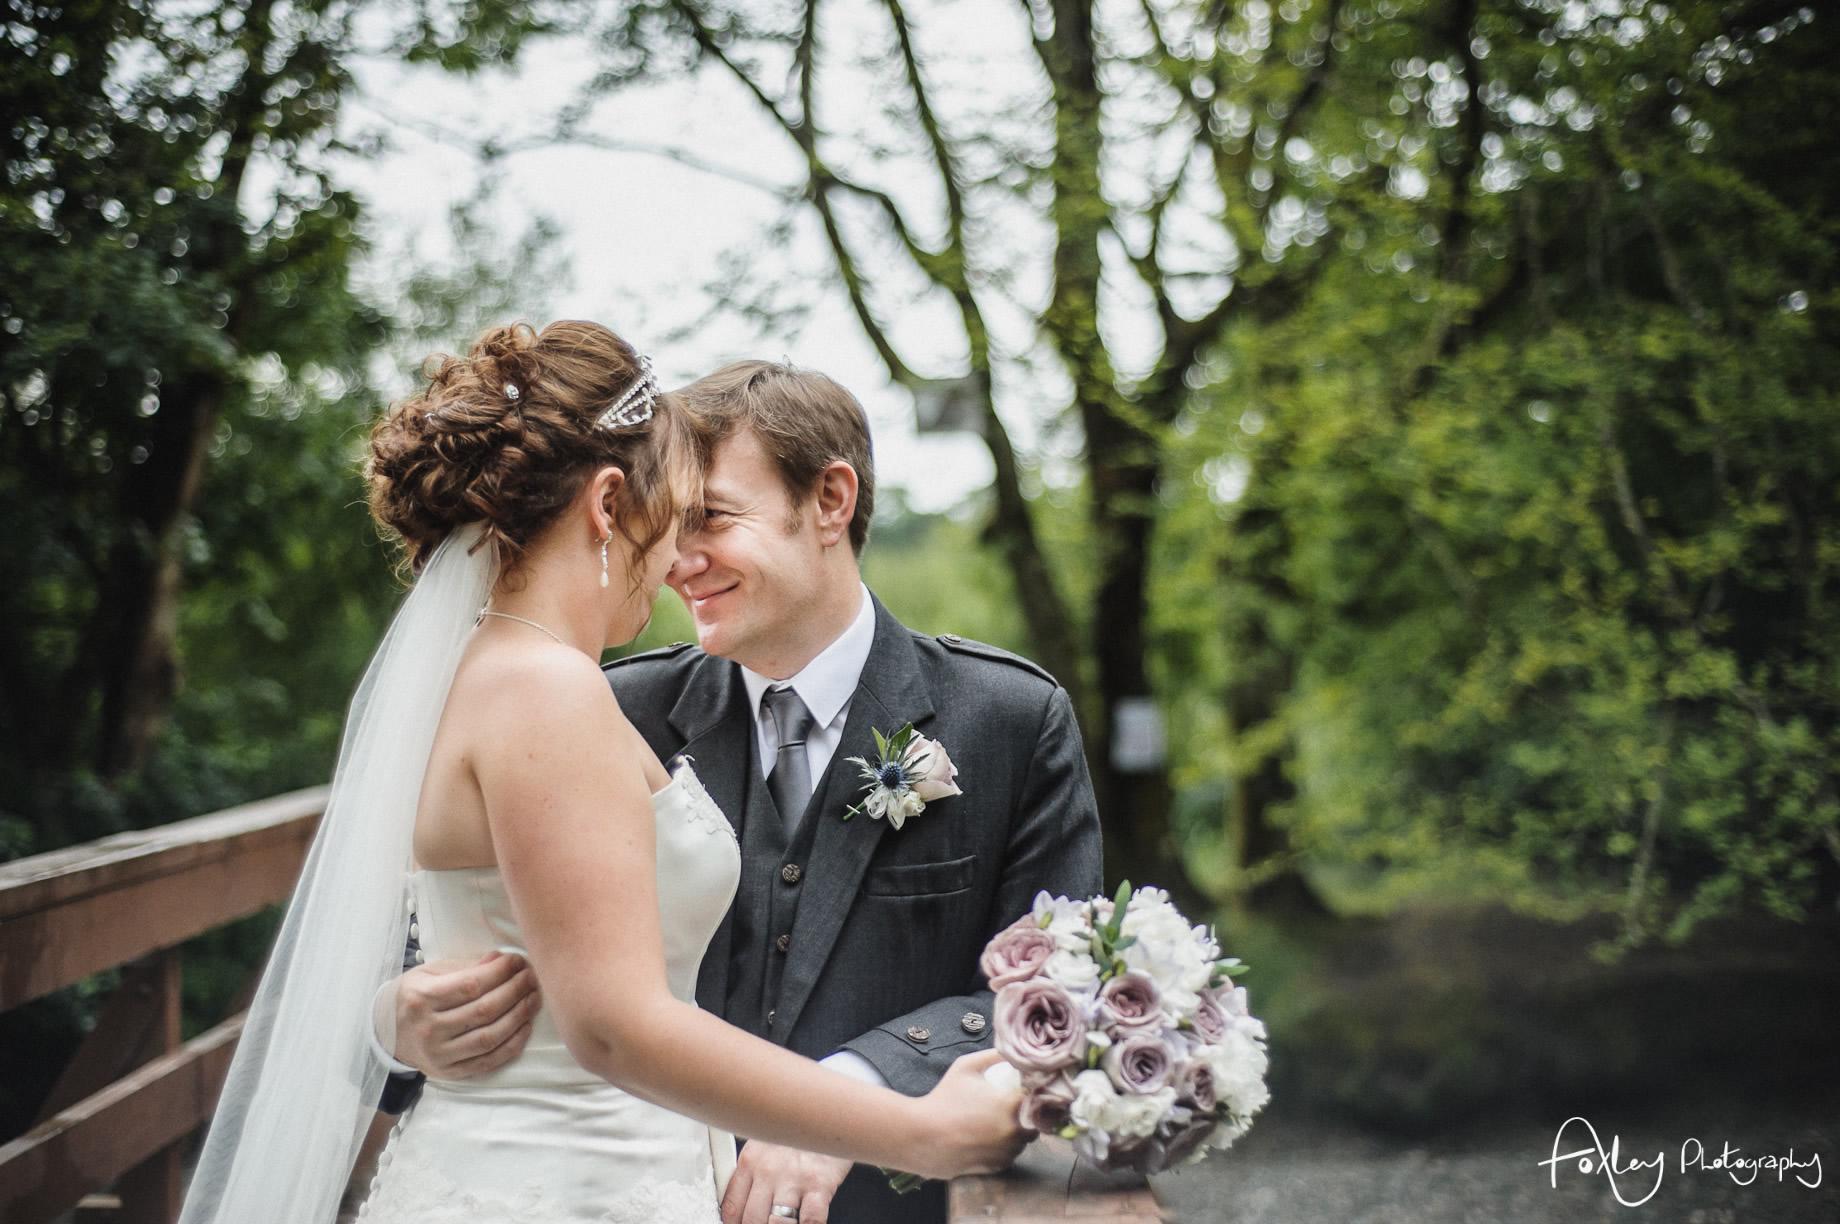 Alys-And-Davids-Wedding-Loch-Lomond-117